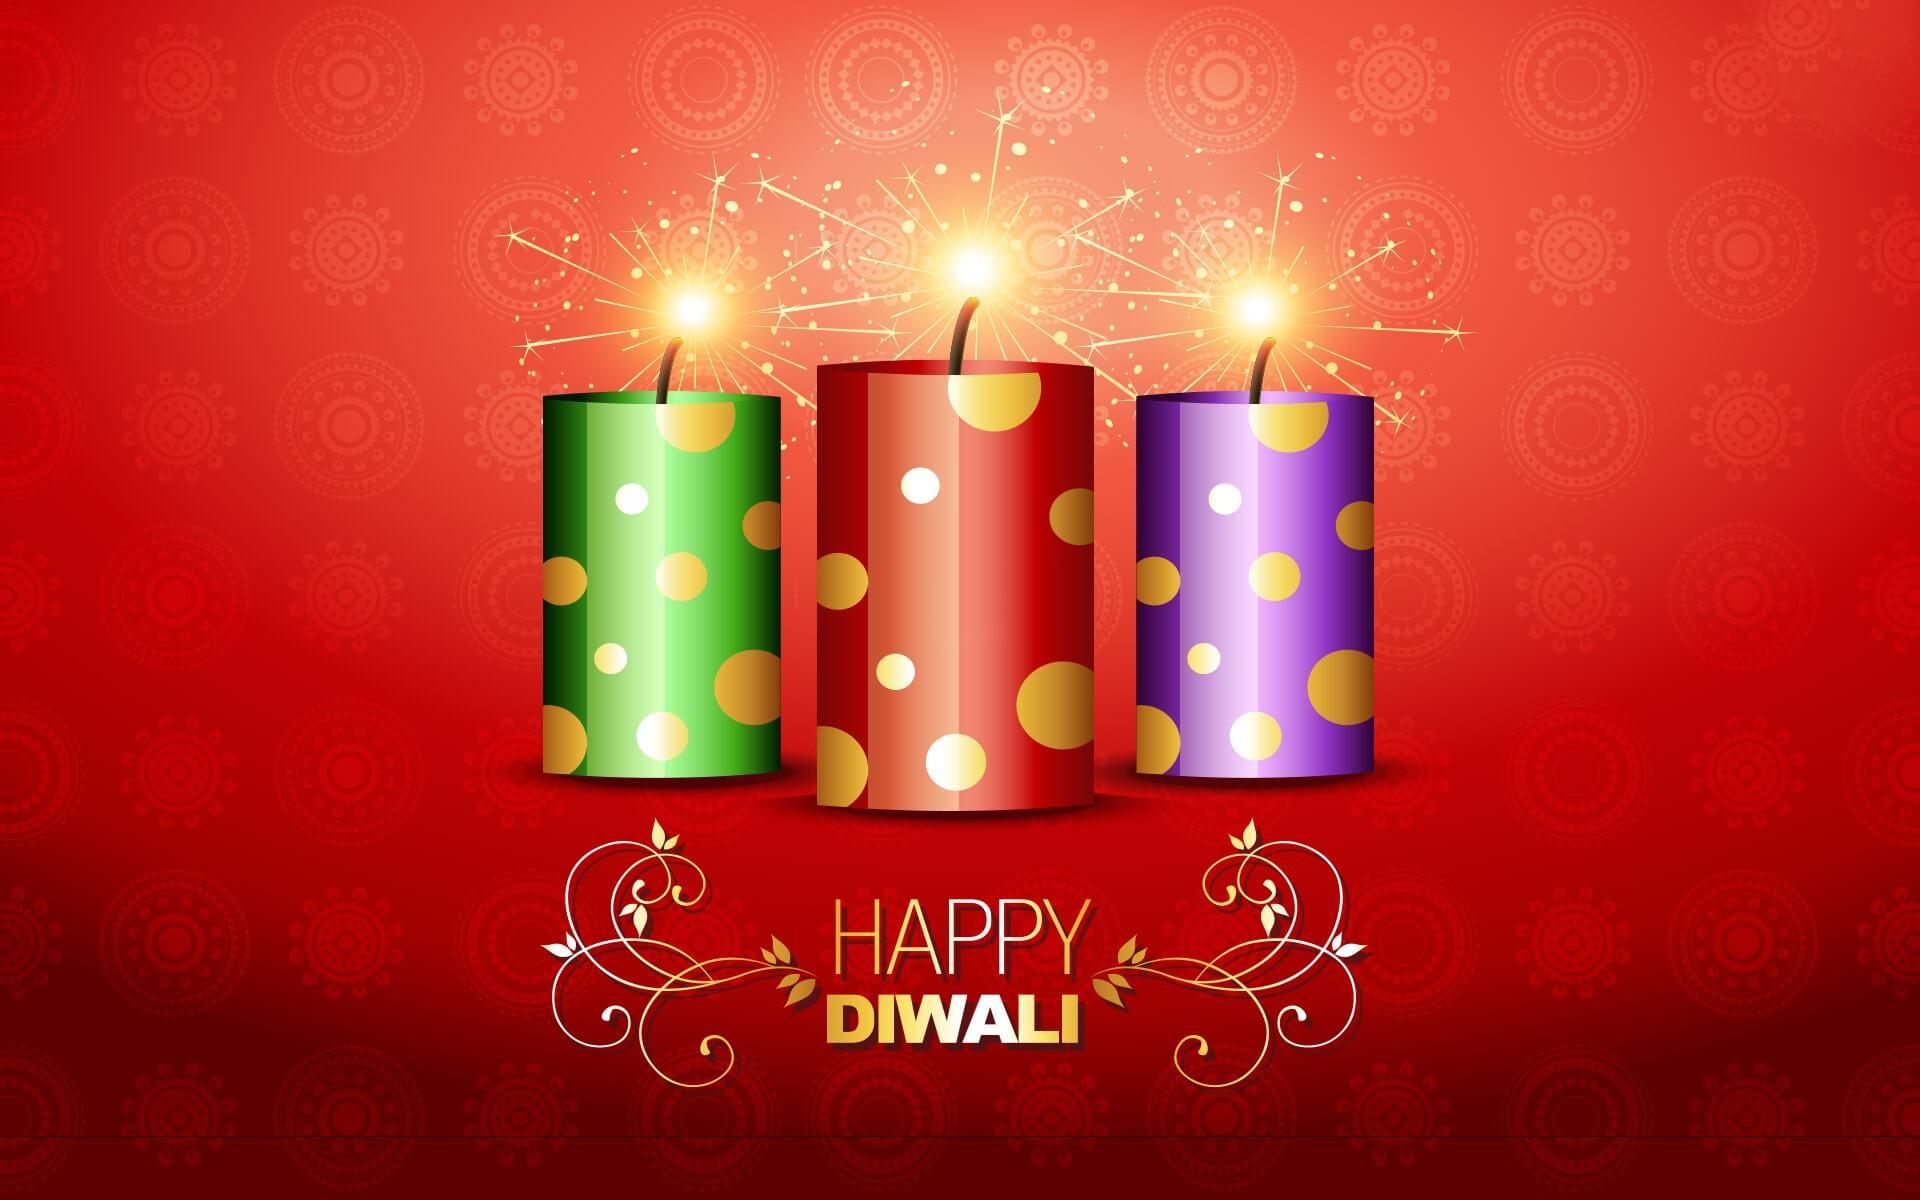 happy diwali wishes crackers free hd wallpaper